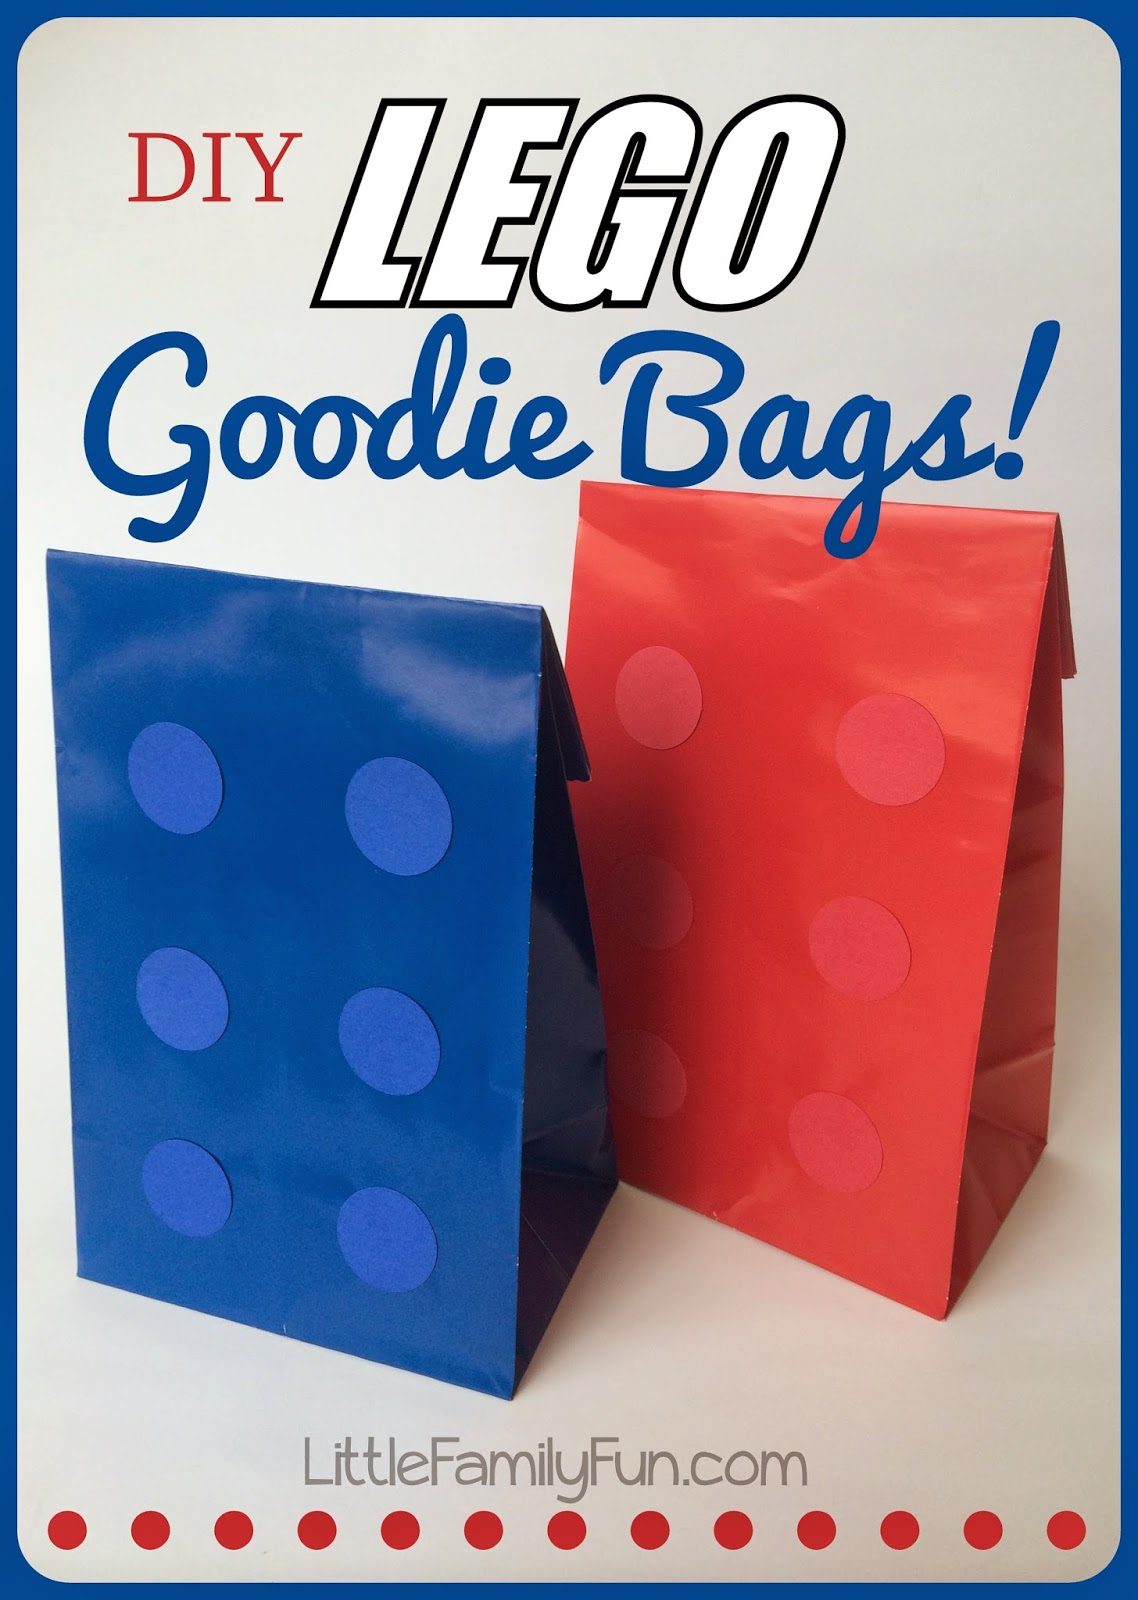 http://www.littlefamilyfun.com/2014/03/lego-goodie-bags.html